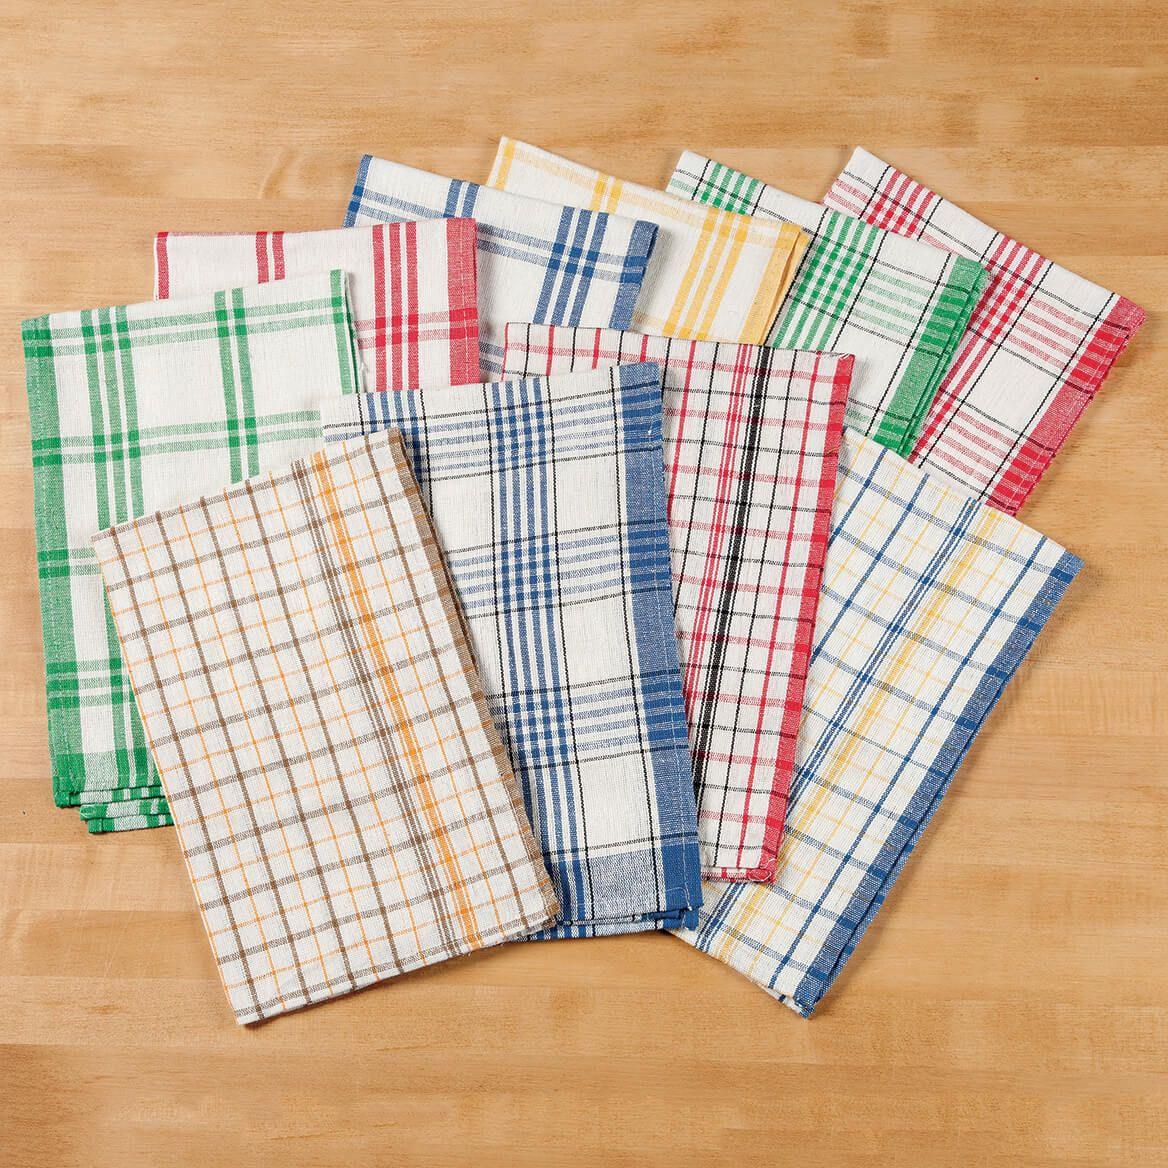 Plaid Kitchen Towels - Set of 10-350528